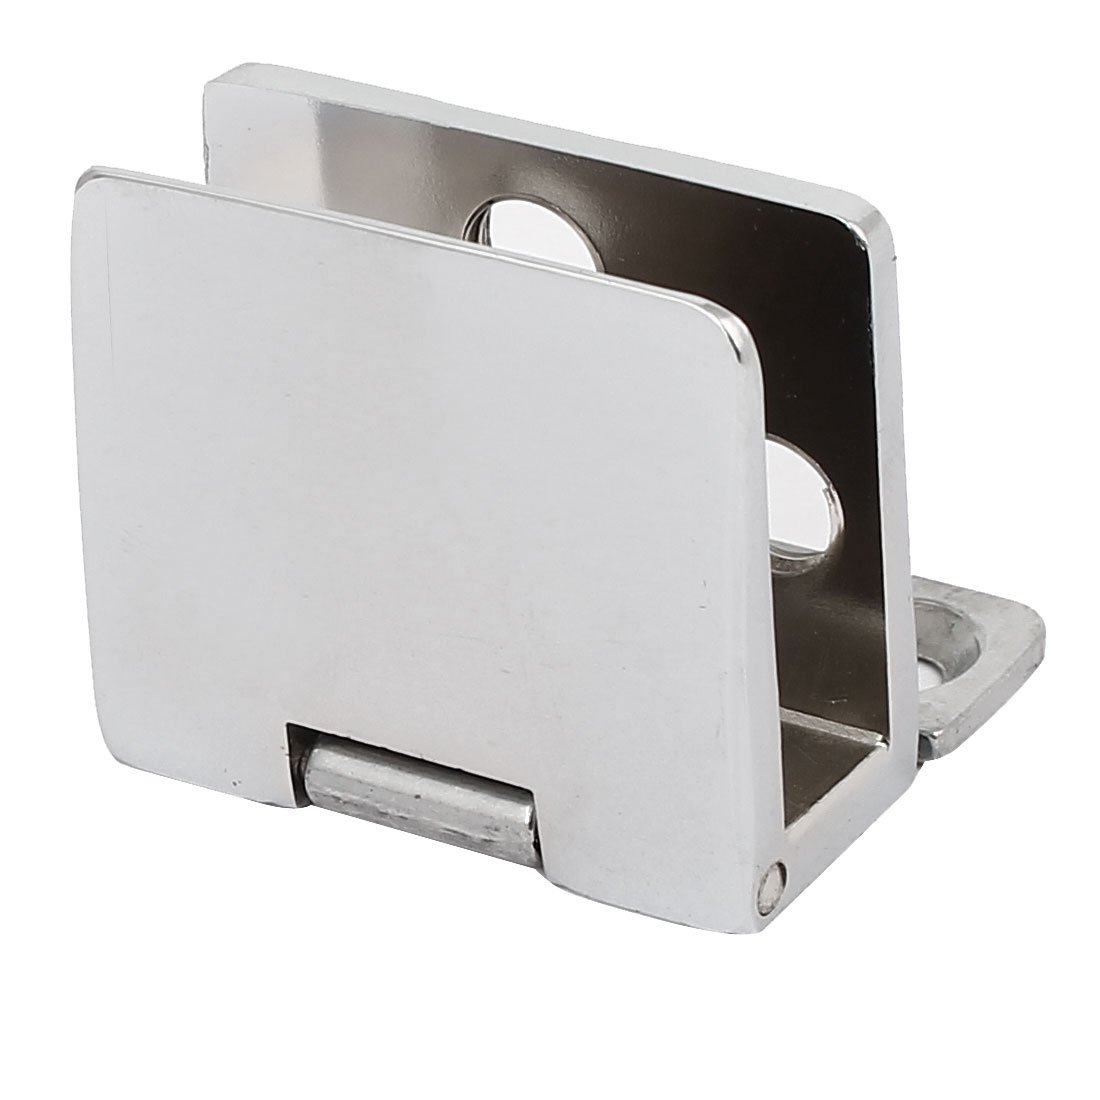 sourcingmap® Clip de cierre de Bisagras de metal para puerta de vidrio de 5mm-8mm de espesor a16120100ux0374